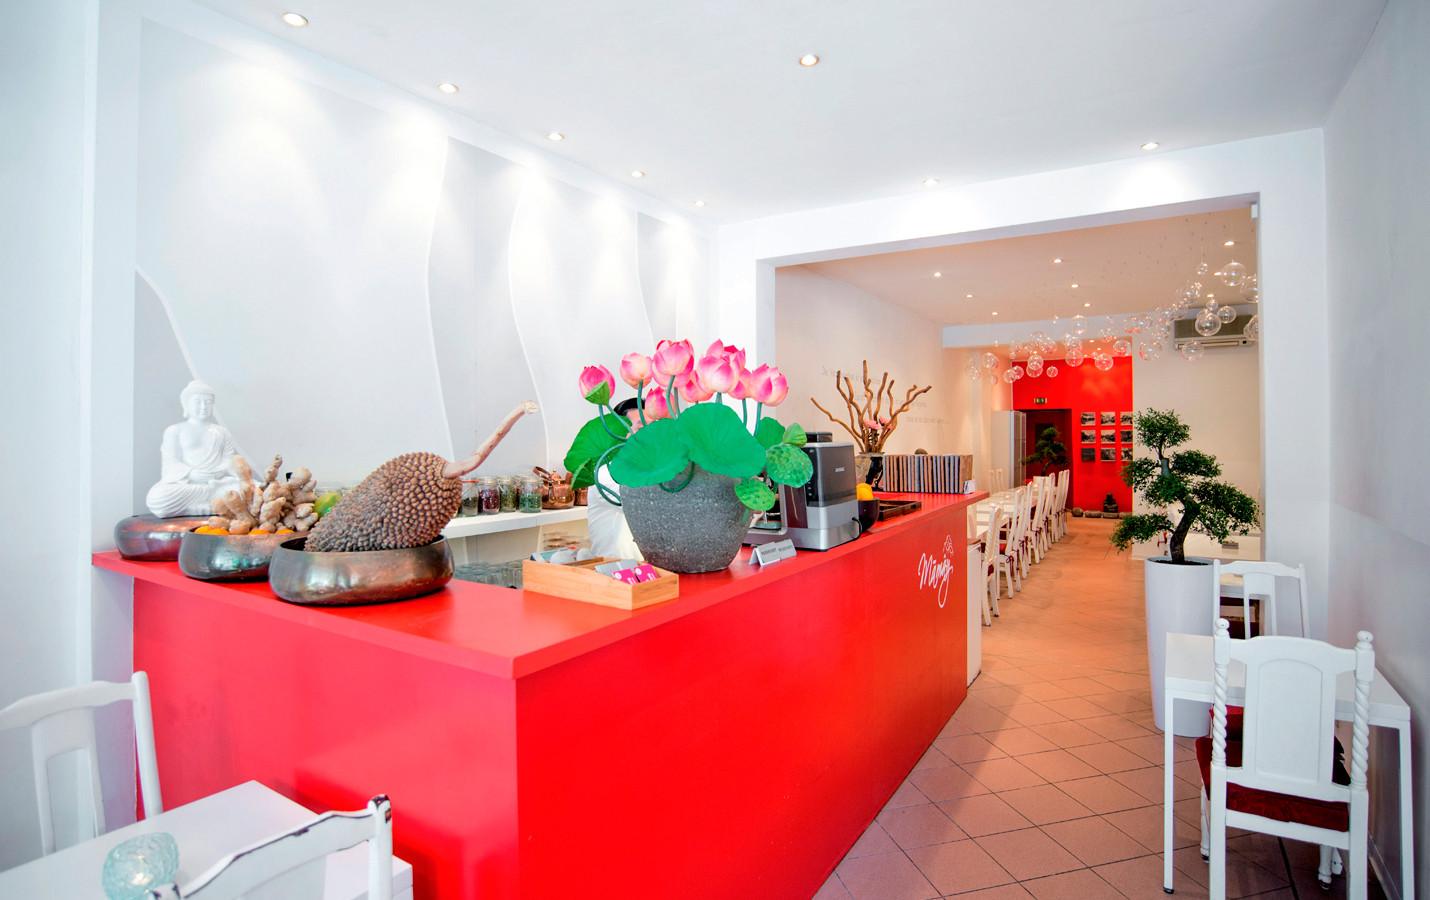 RESTAURANT MAMAY - Vietnamesische Küche & Teehaus